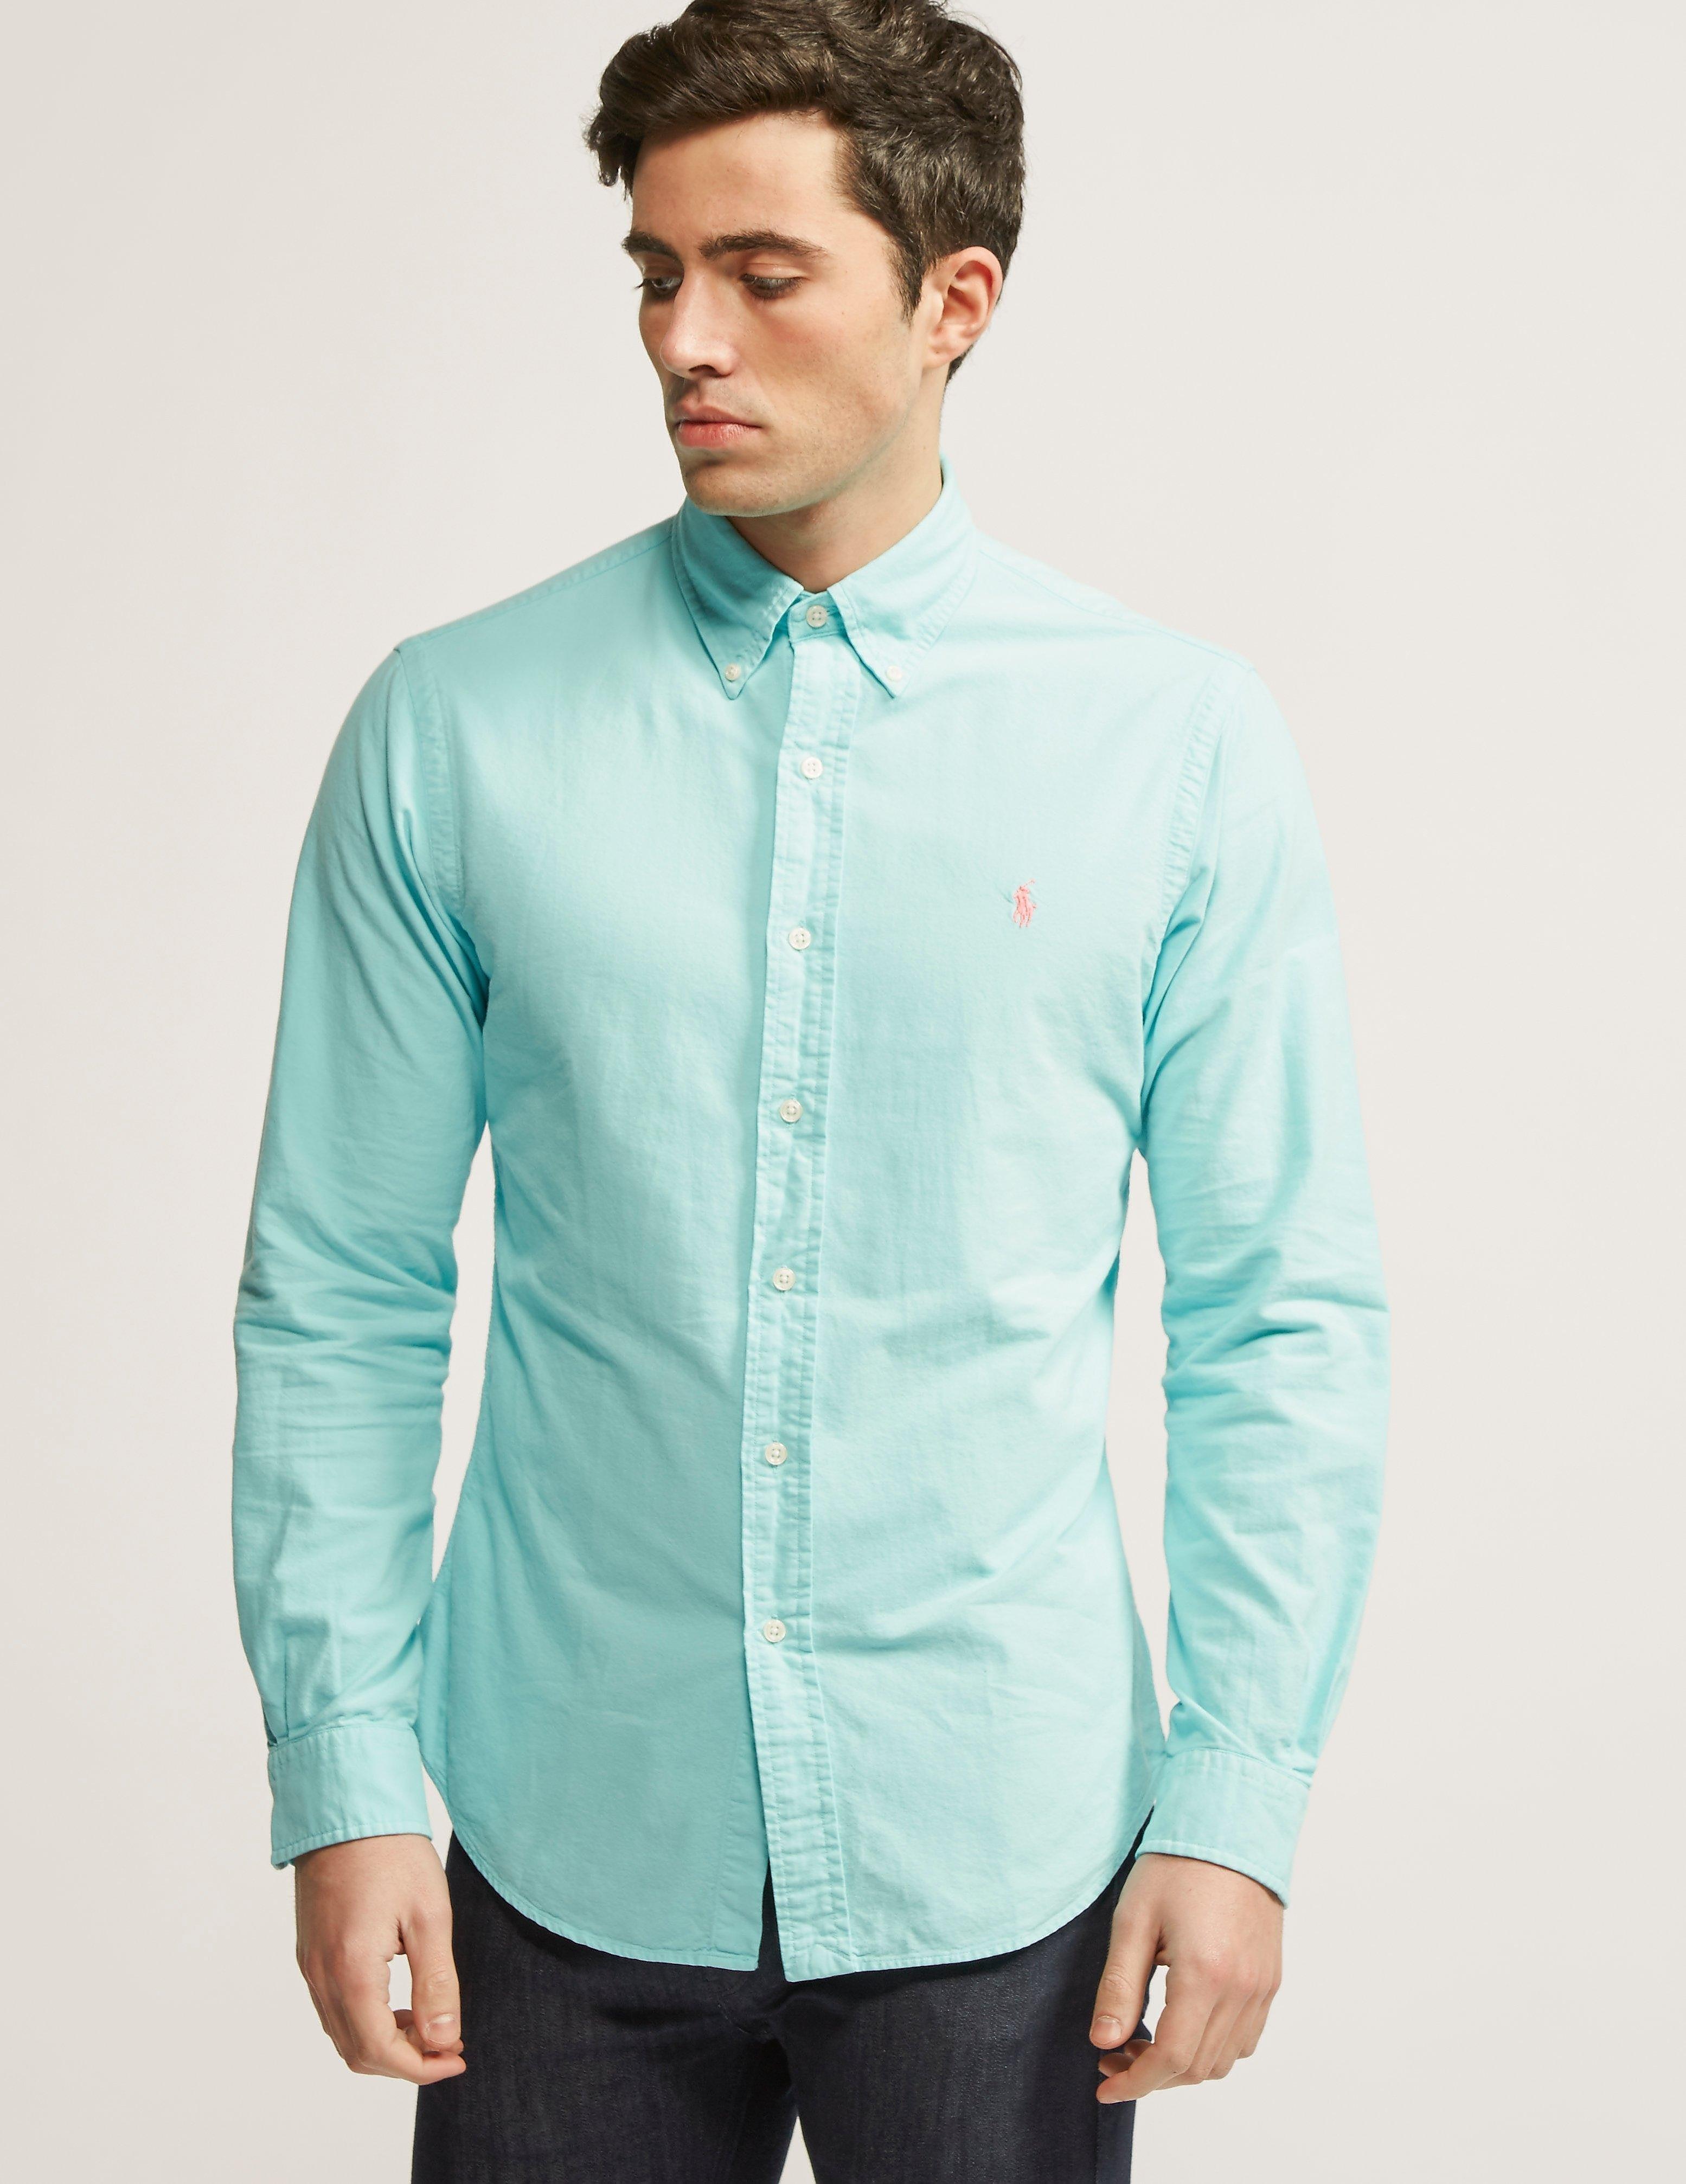 Polo Ralph Lauren Slim Fit Poplin Shirt